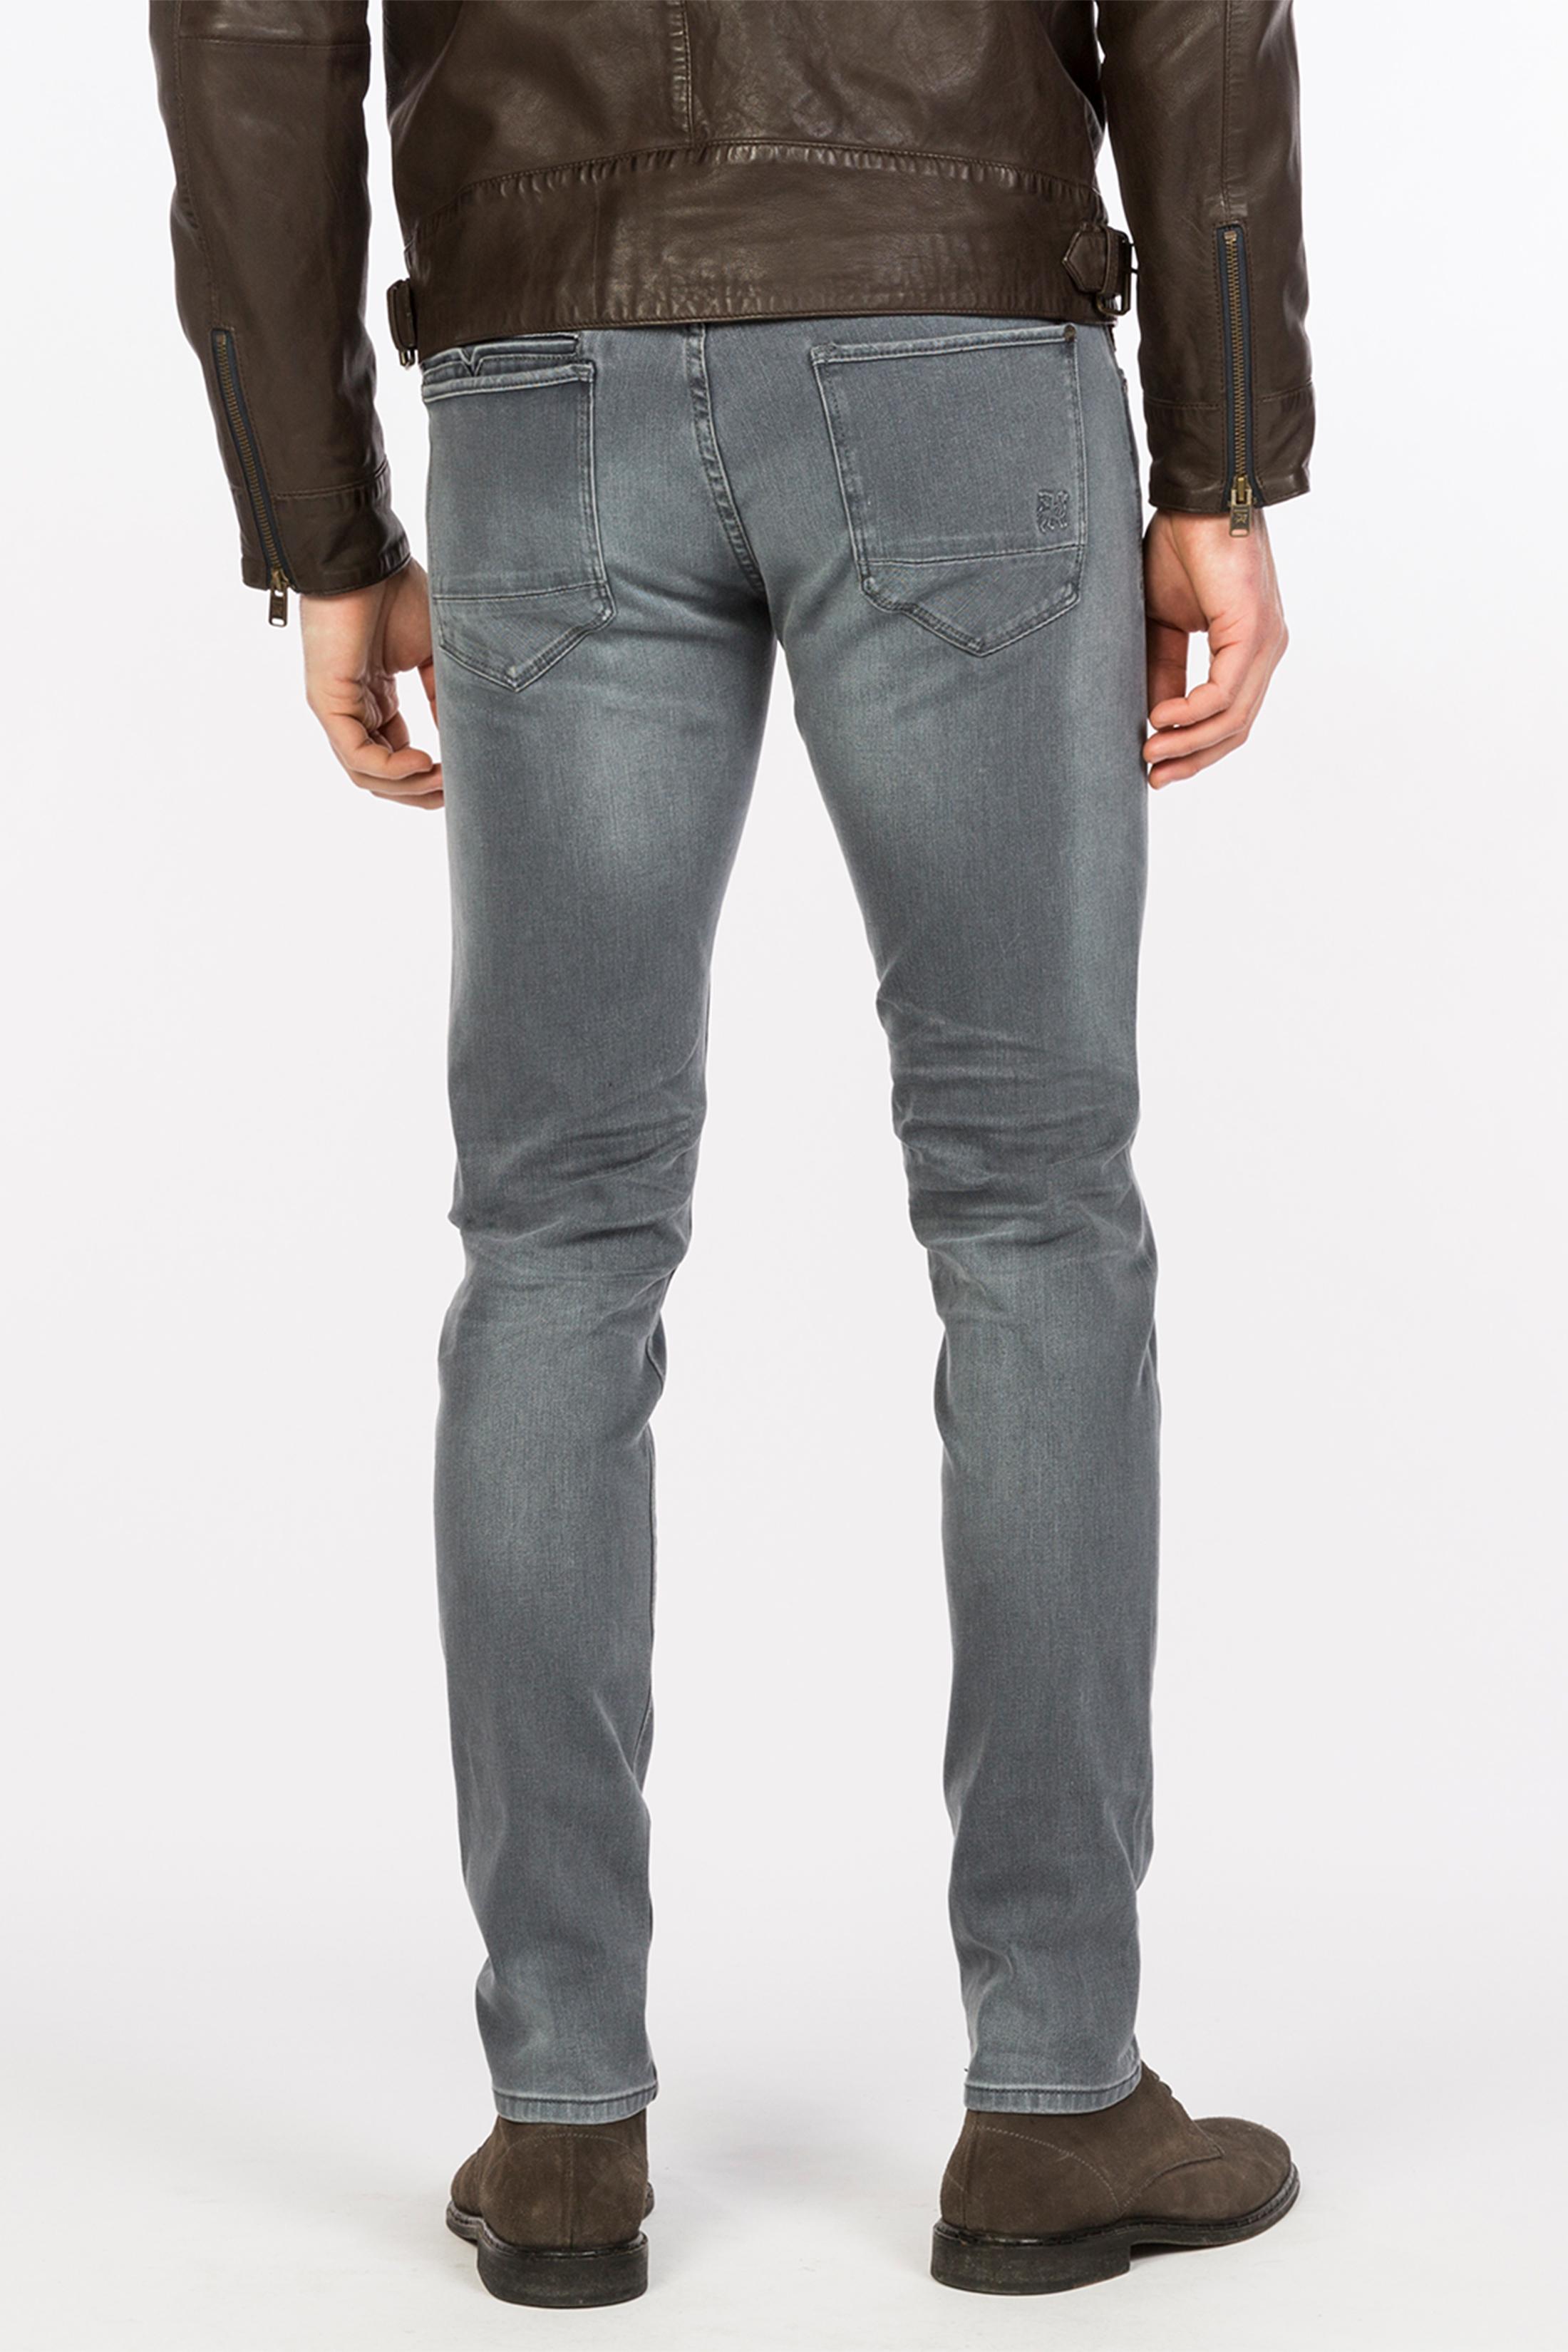 Vanguard V850 Rider Grey Jeans foto 5